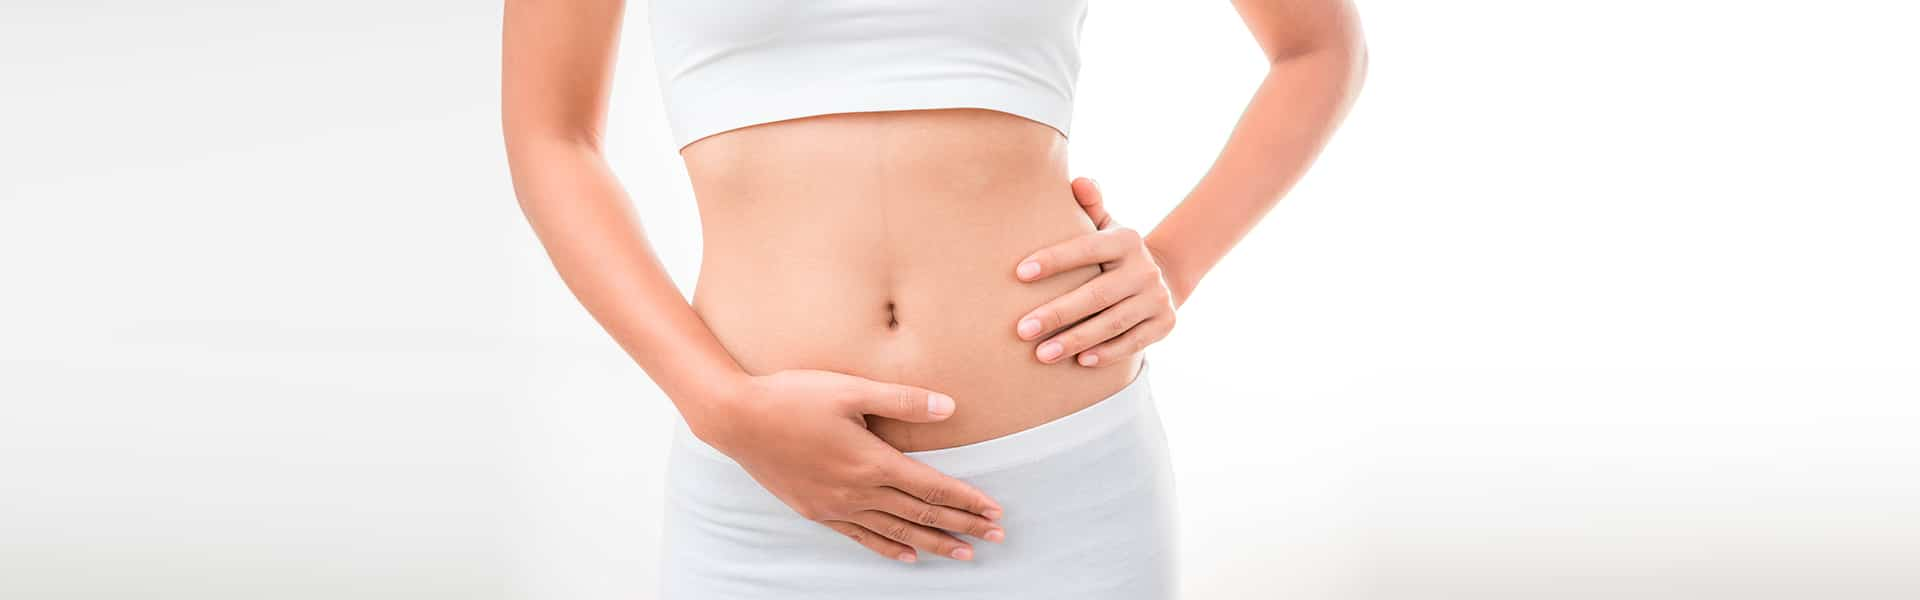 Endocrino madrid adelgazar barriga